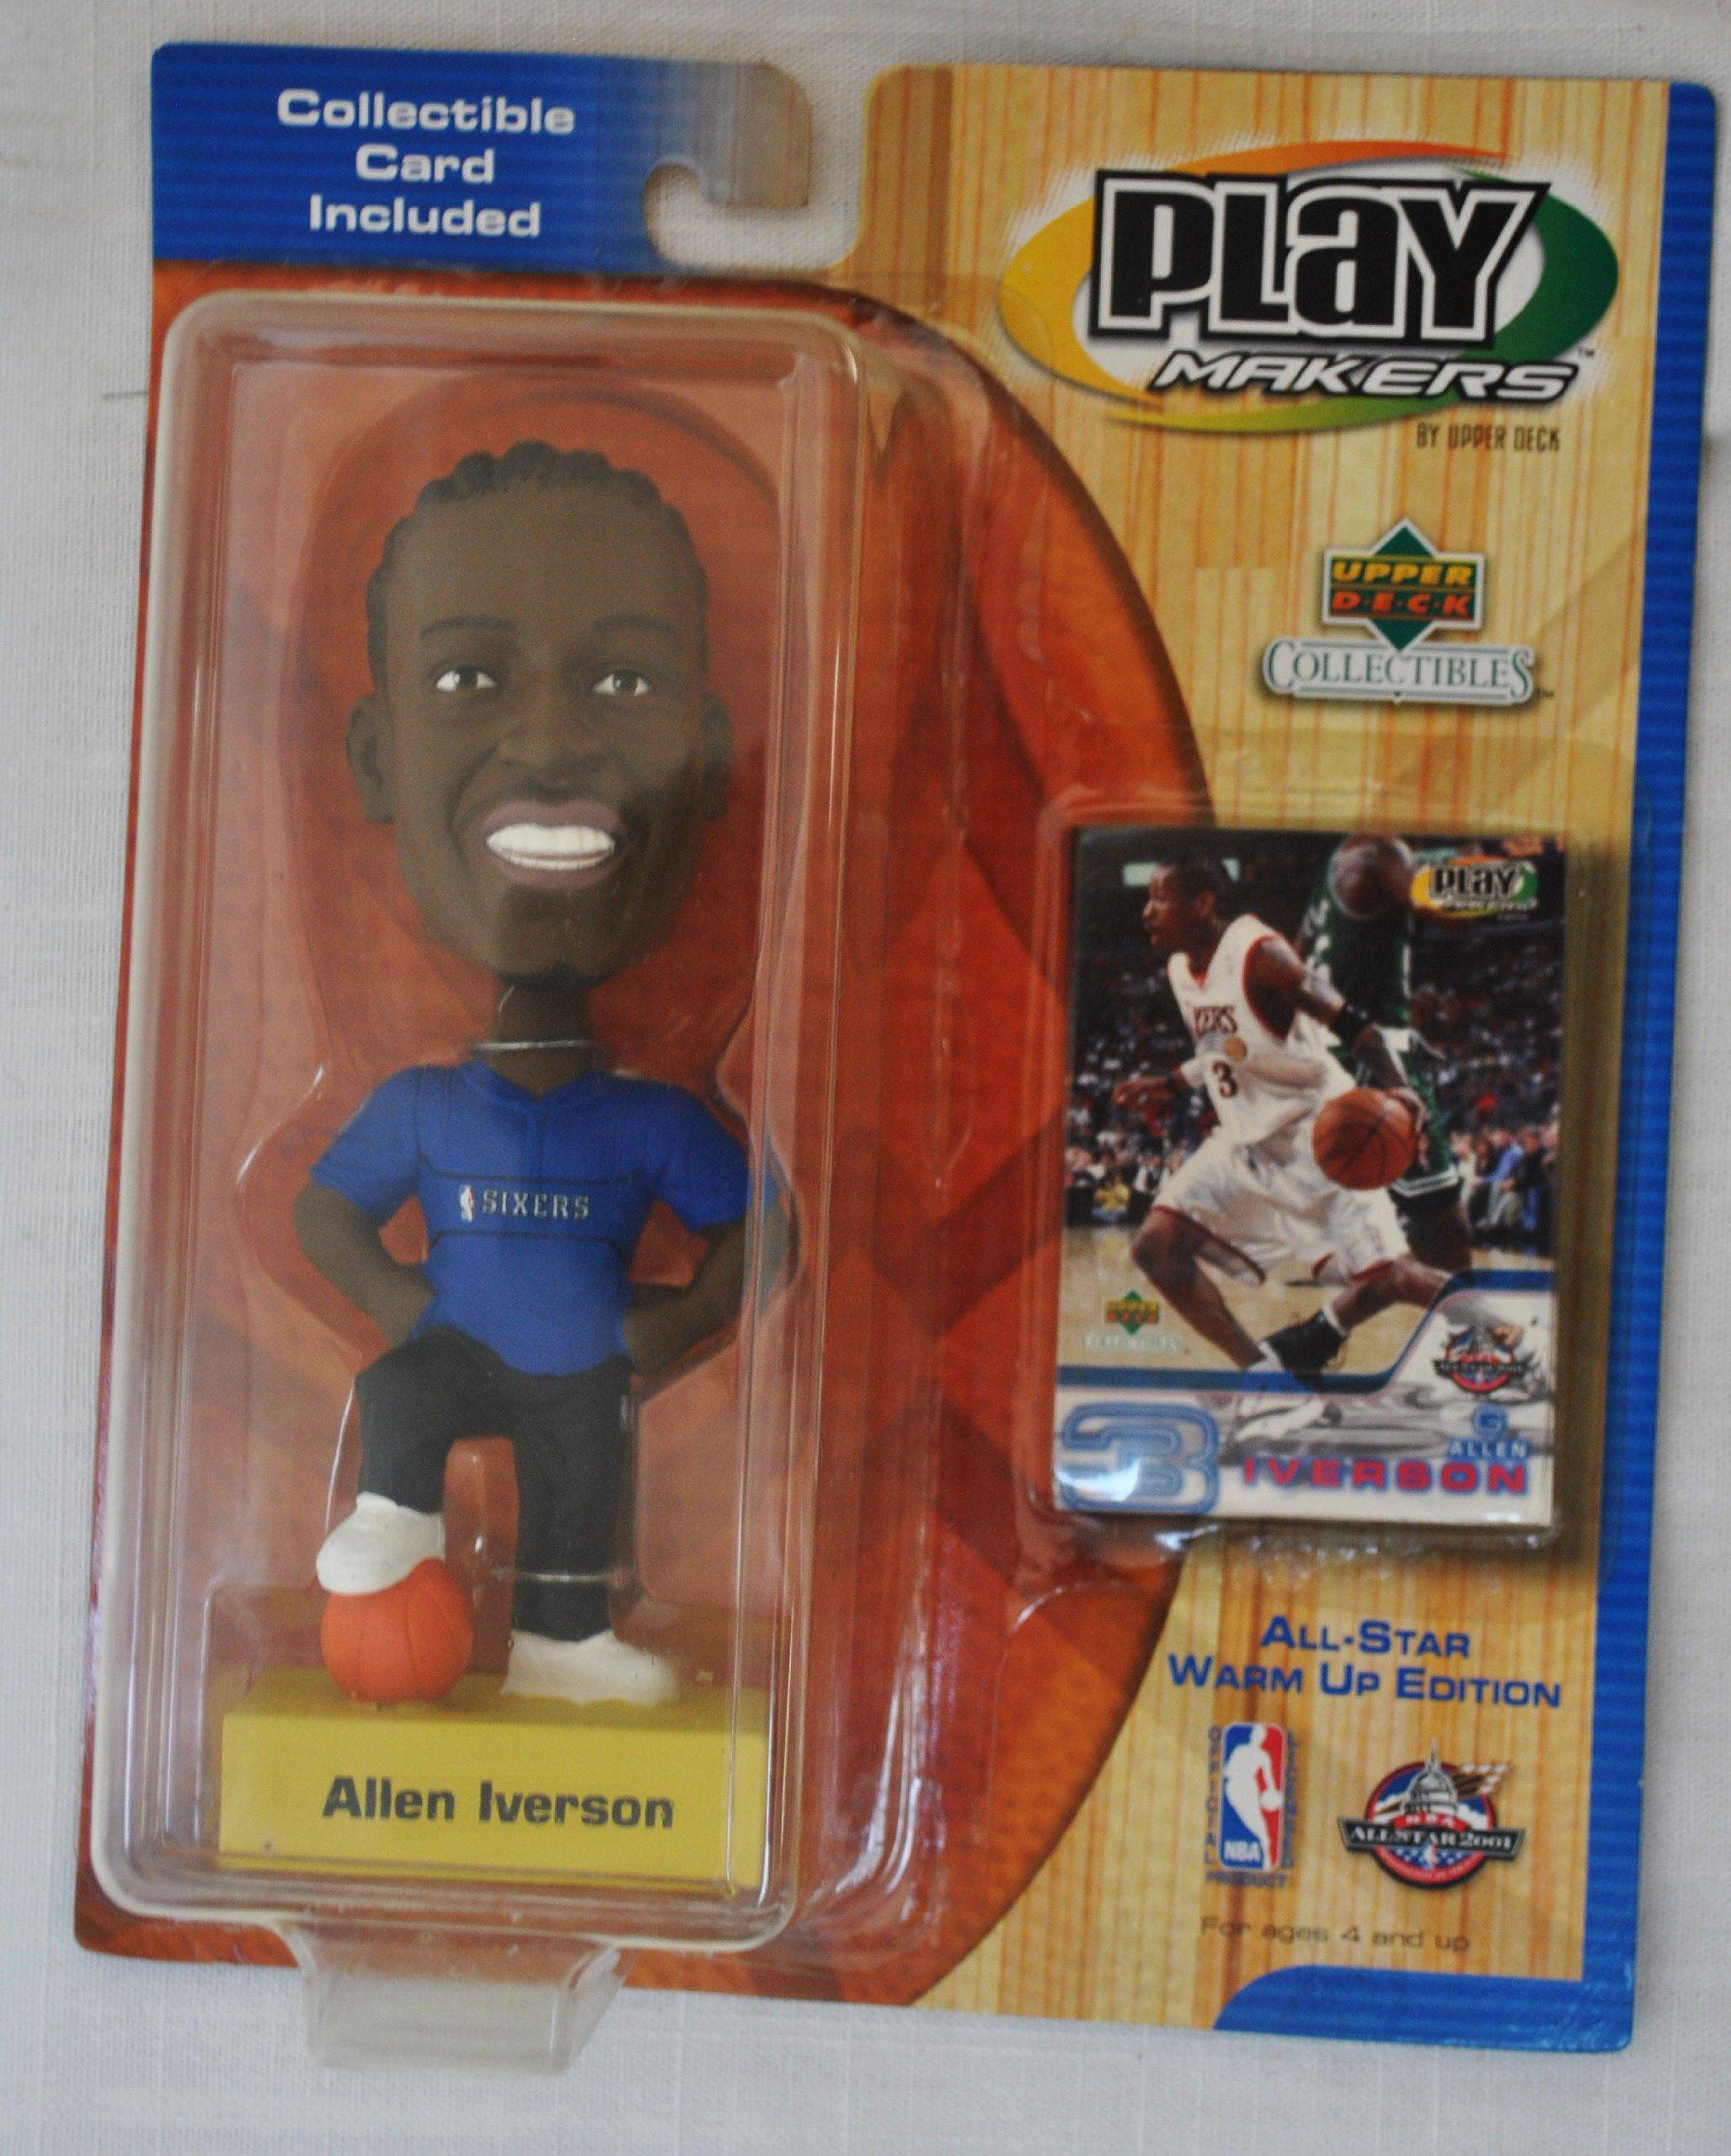 Philadelphia 76ers star #3 Allen Iverson official NBA Upper Deck Playmakers Bobble card set Bobblehead by Upper Deck